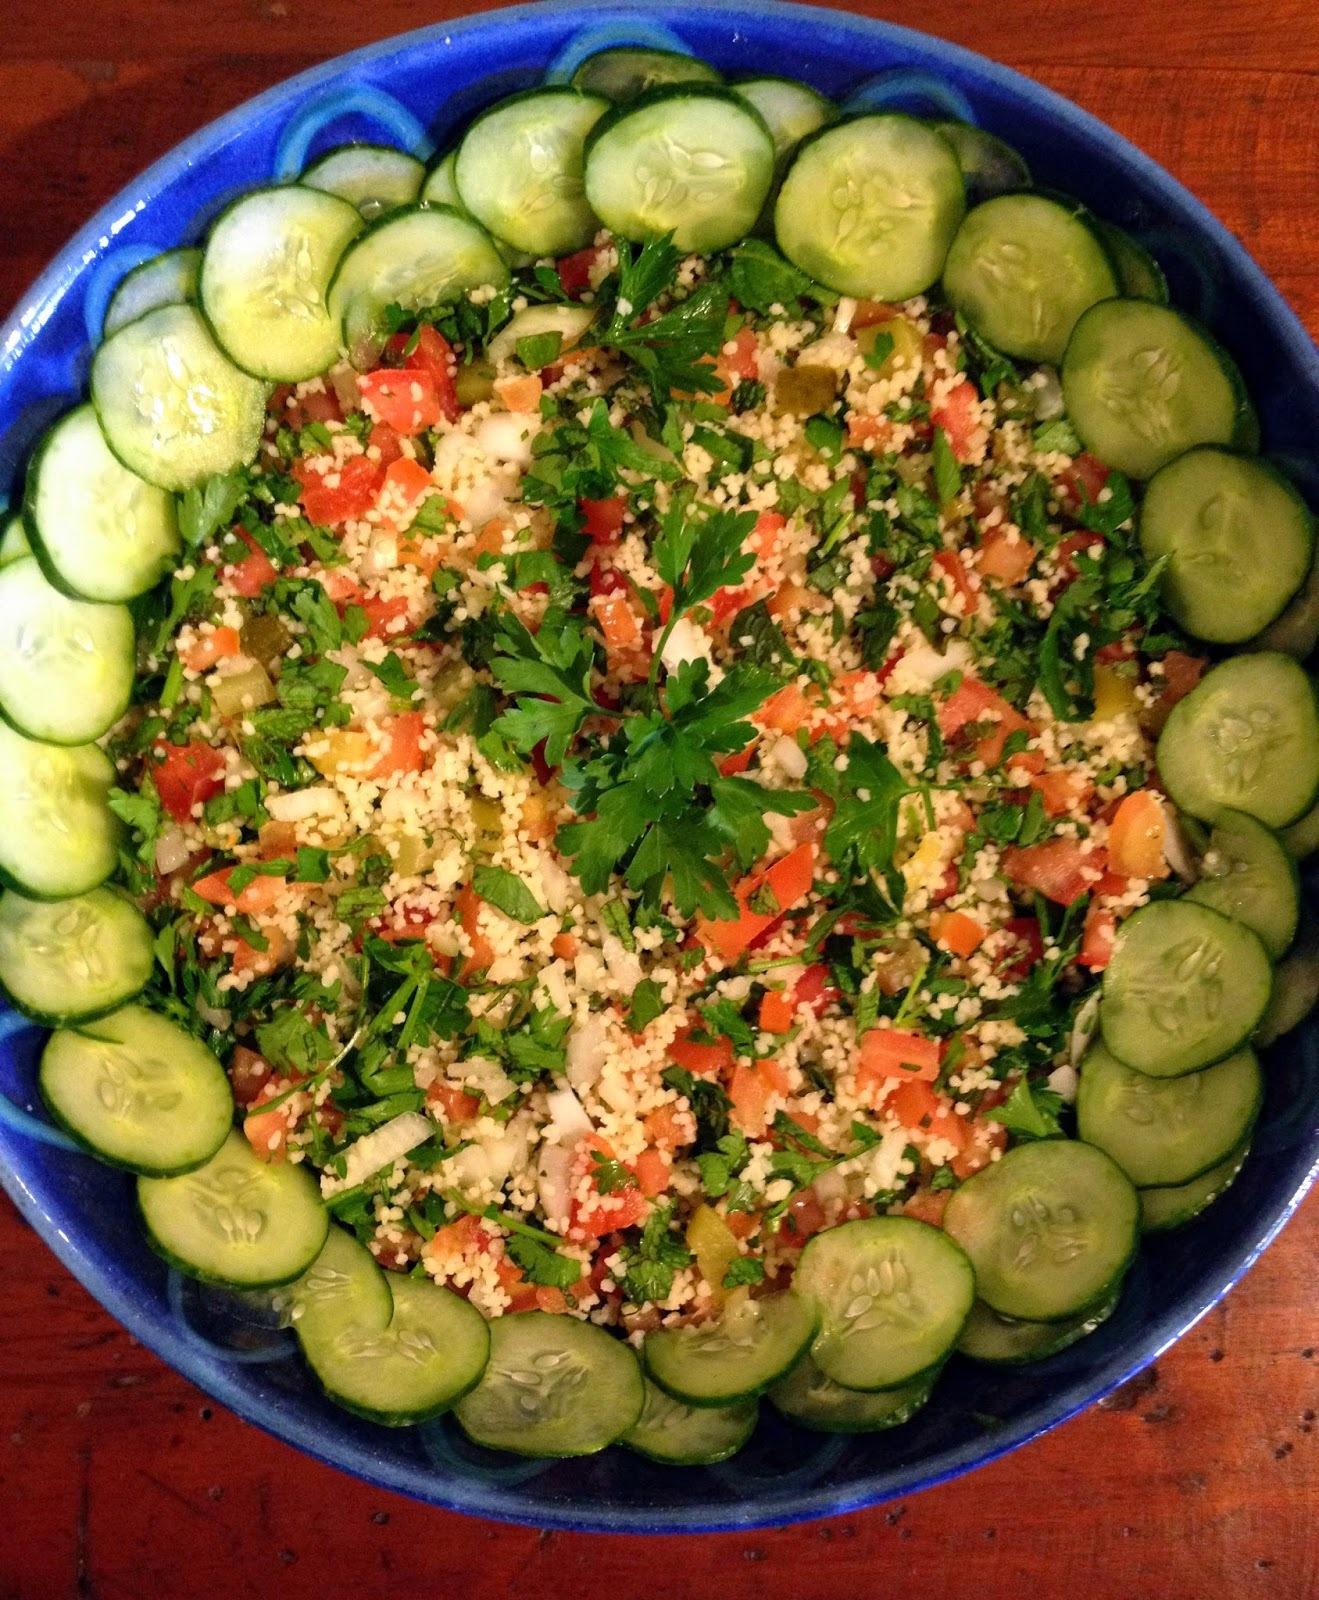 Para quem gosta de salada mediterrânea - Tabule